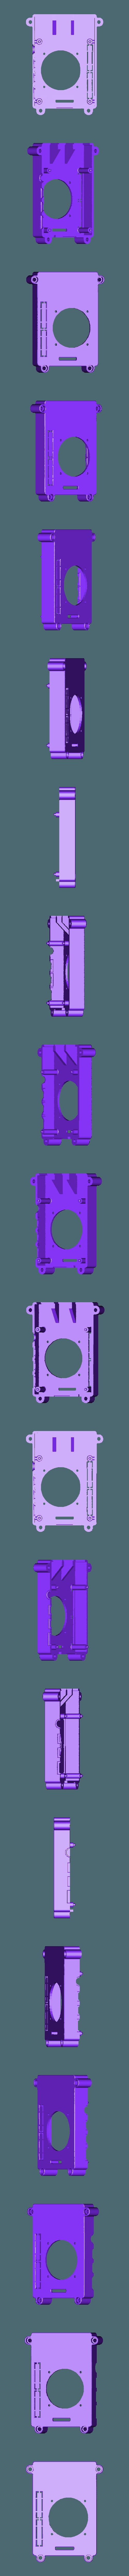 FULL_40MM_SLOTTED_BLANK.STL Télécharger fichier STL gratuit Étui Pi 4B Framboise Framboise • Objet pour imprimante 3D, mkellsy